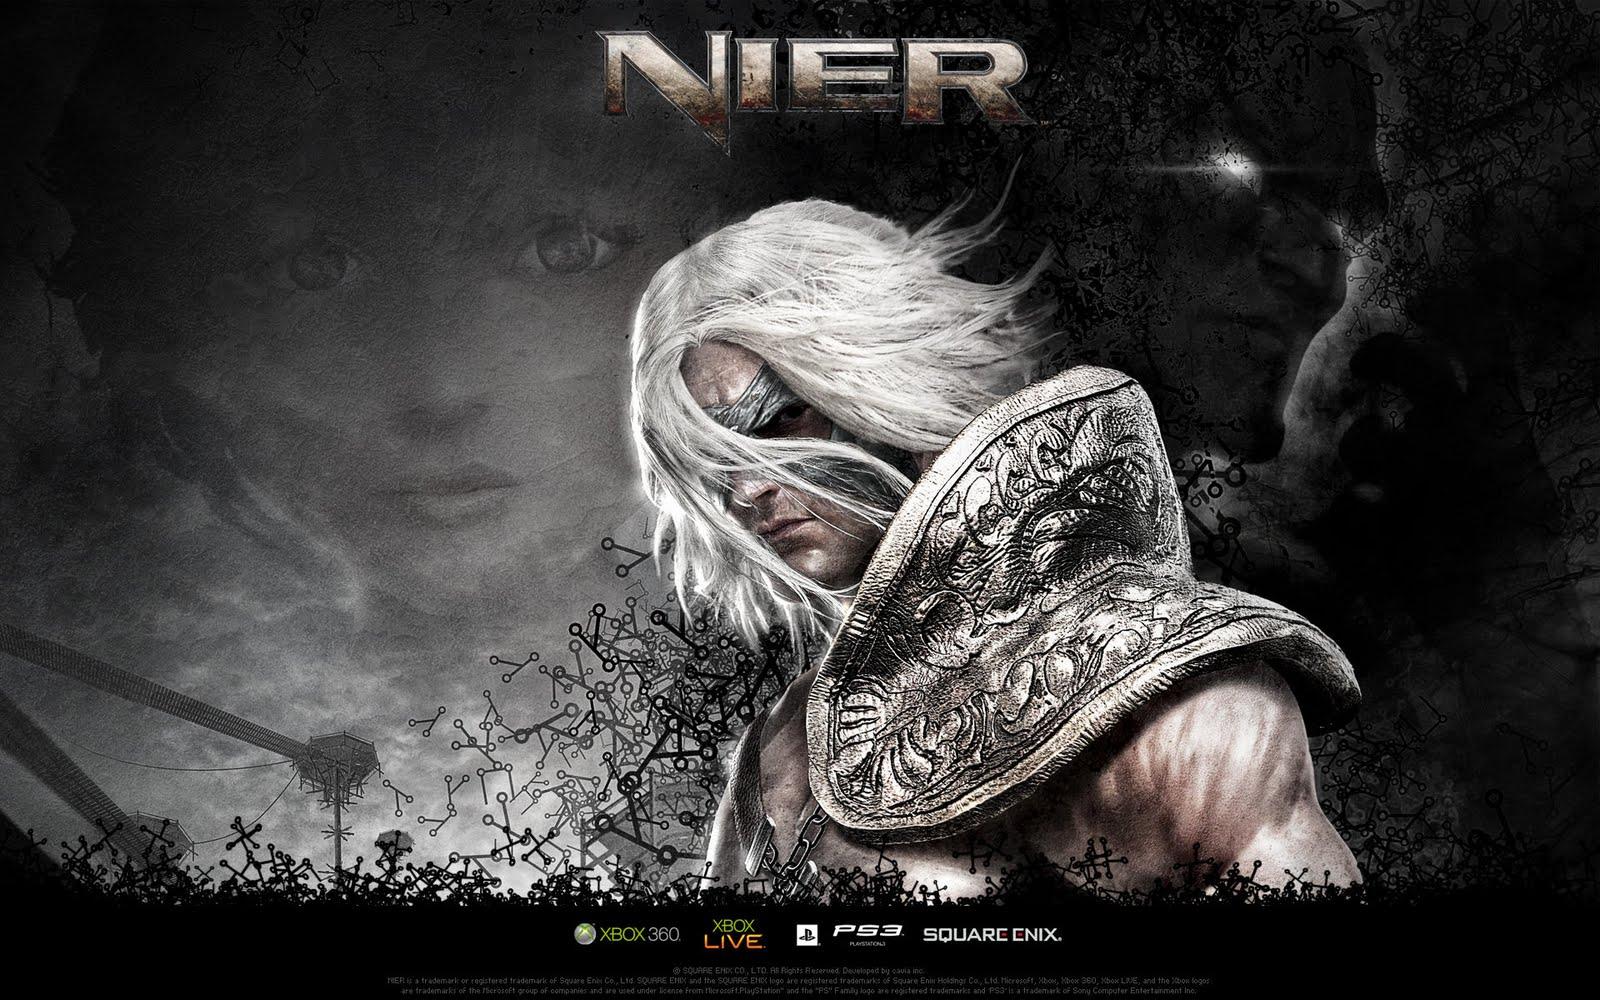 http://2.bp.blogspot.com/_V6TVDECge74/TF6DhYswyqI/AAAAAAAAA5E/RCviPkwZGtE/s1600/Fond+d%27ecran+Nier+Xbox+live+pc+wallpaper.jpg